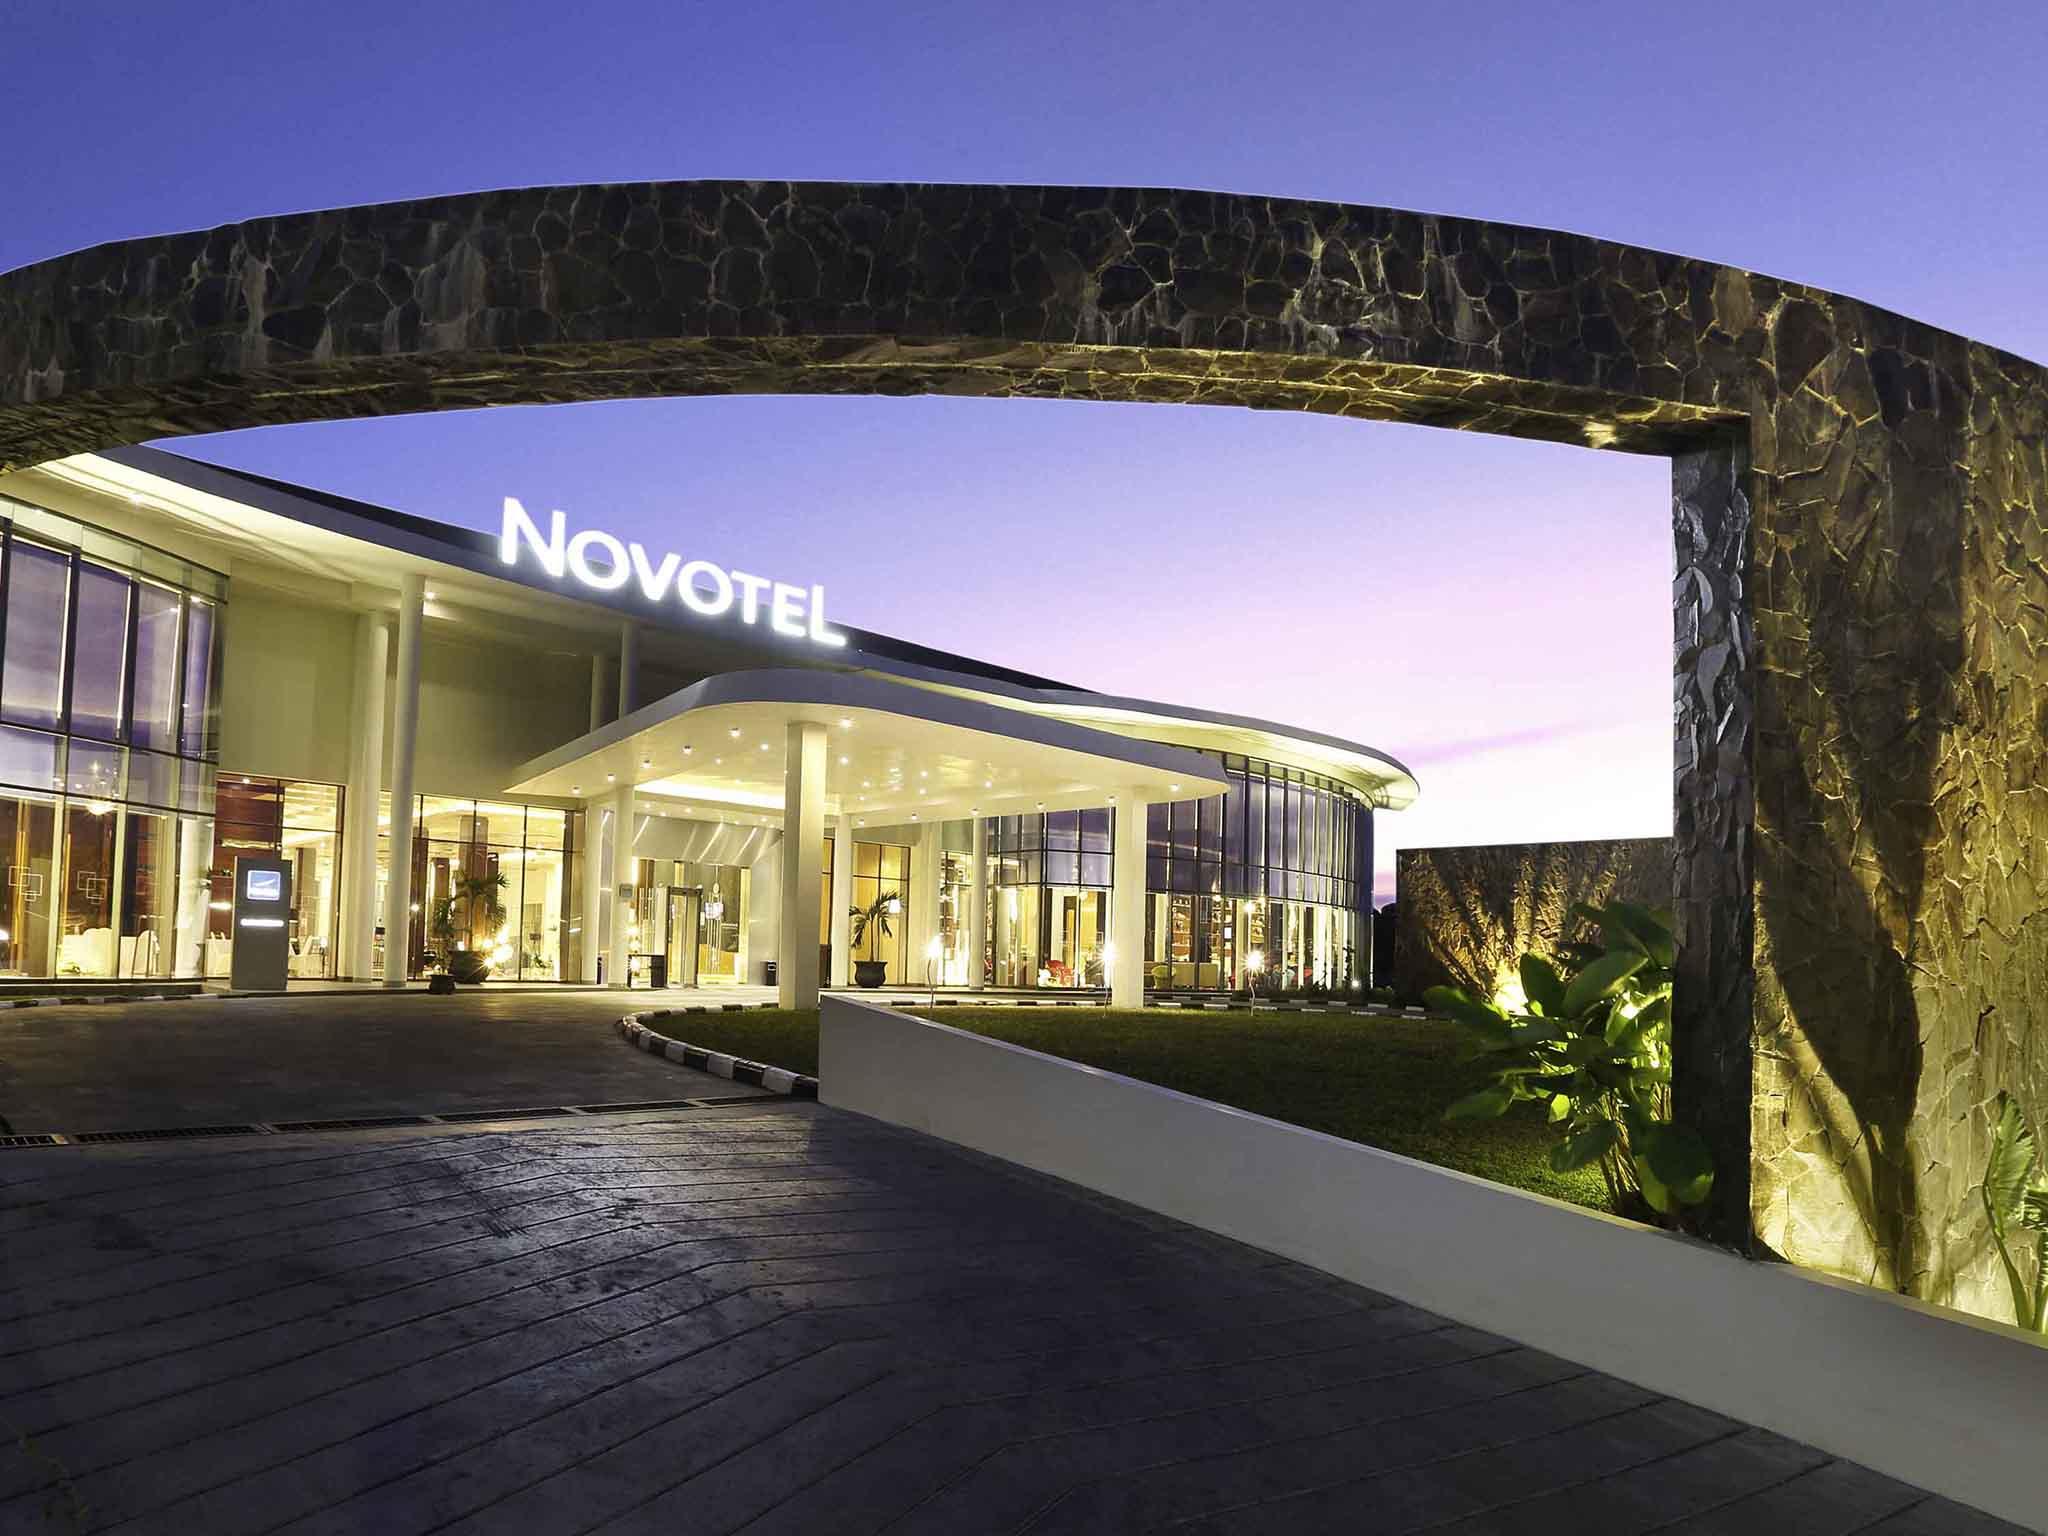 فندق - Novotel Banjarmasin Airport